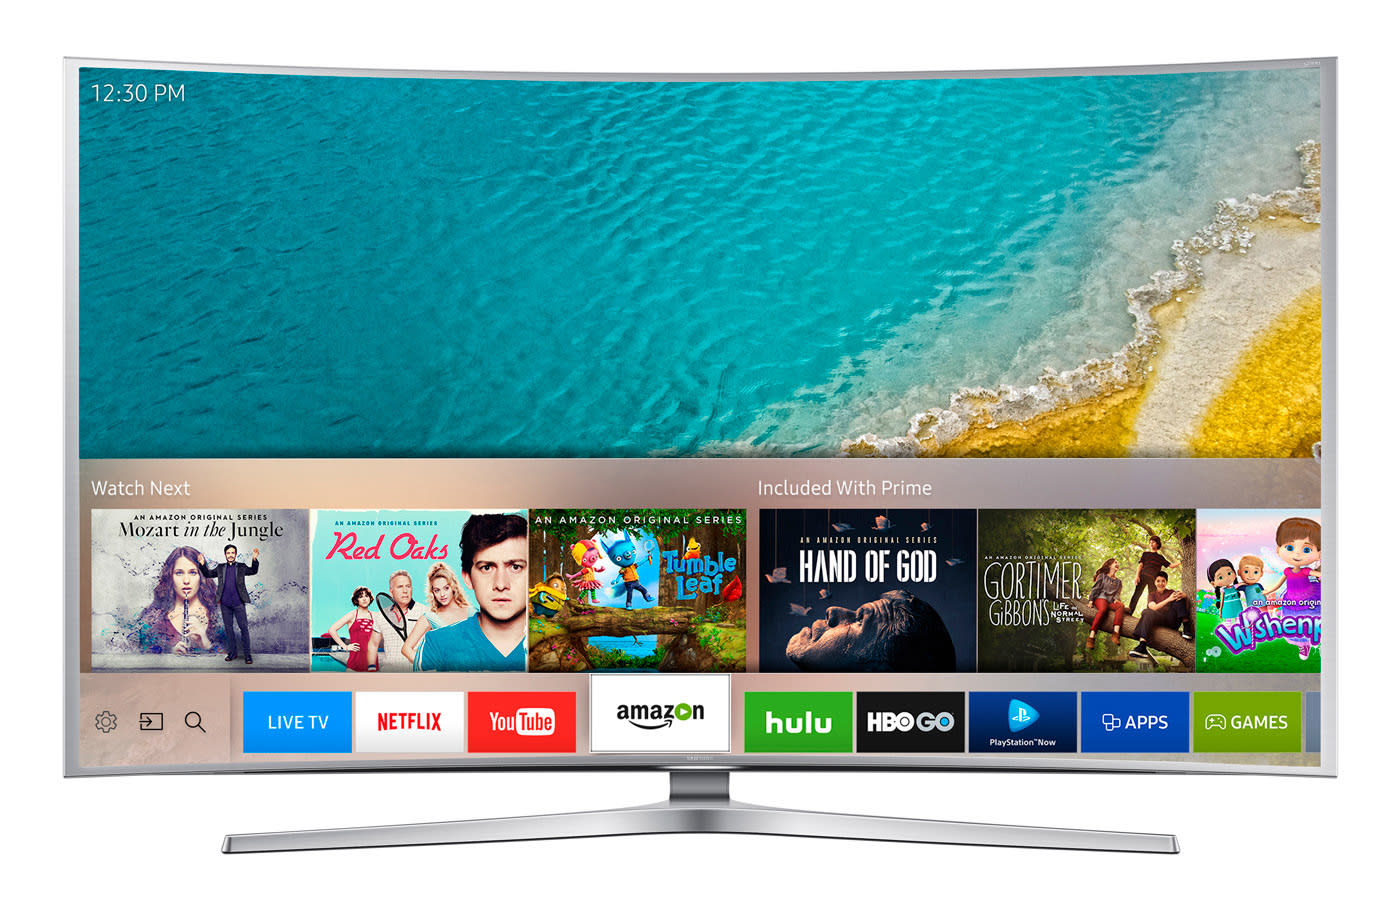 Amazon Prime Samsung Tv Problem